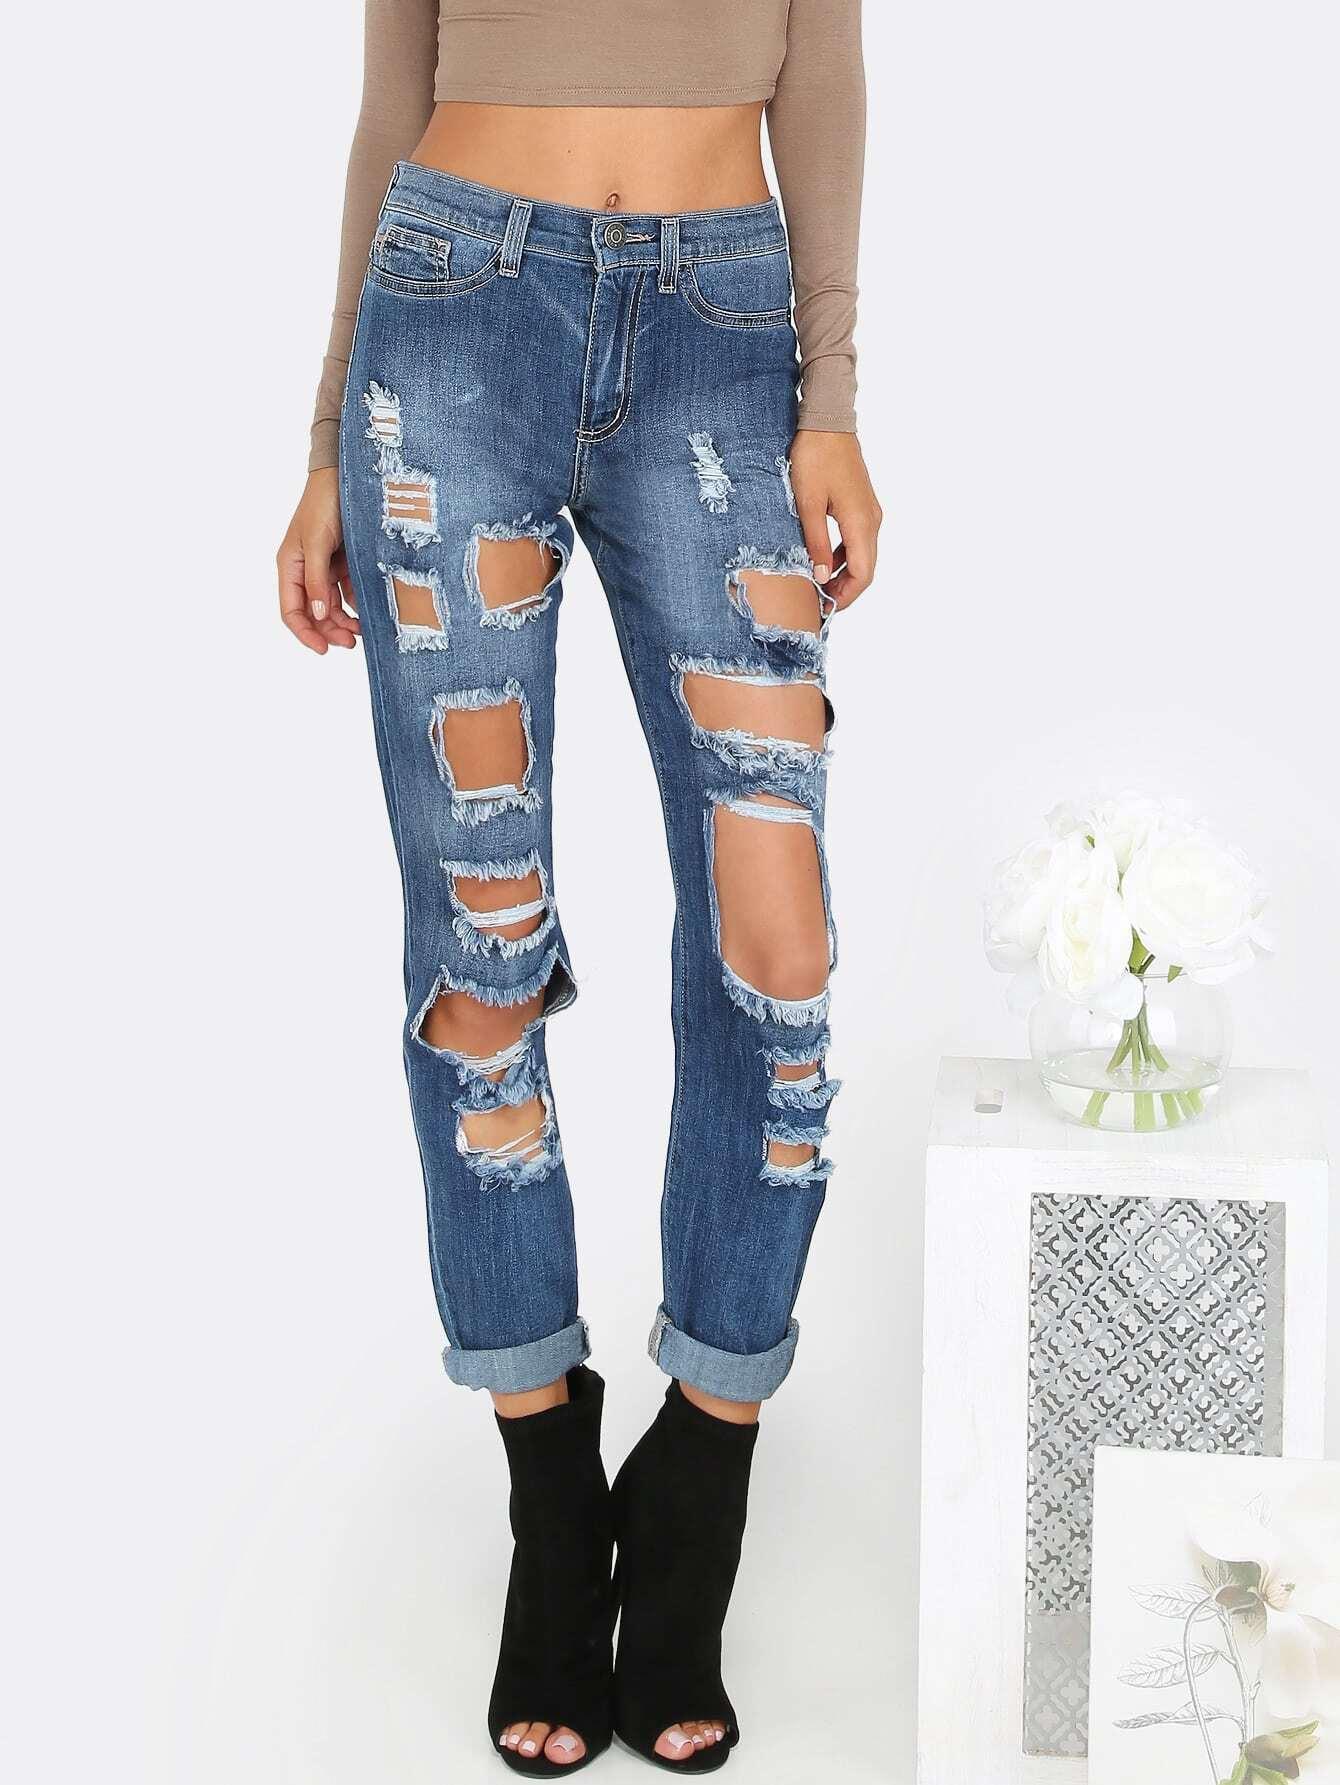 Destroyed Mid Rise Boyfriend Jeans DENIMDestroyed Mid Rise Boyfriend Jeans DENIM<br><br>color: Blue<br>size: M,S